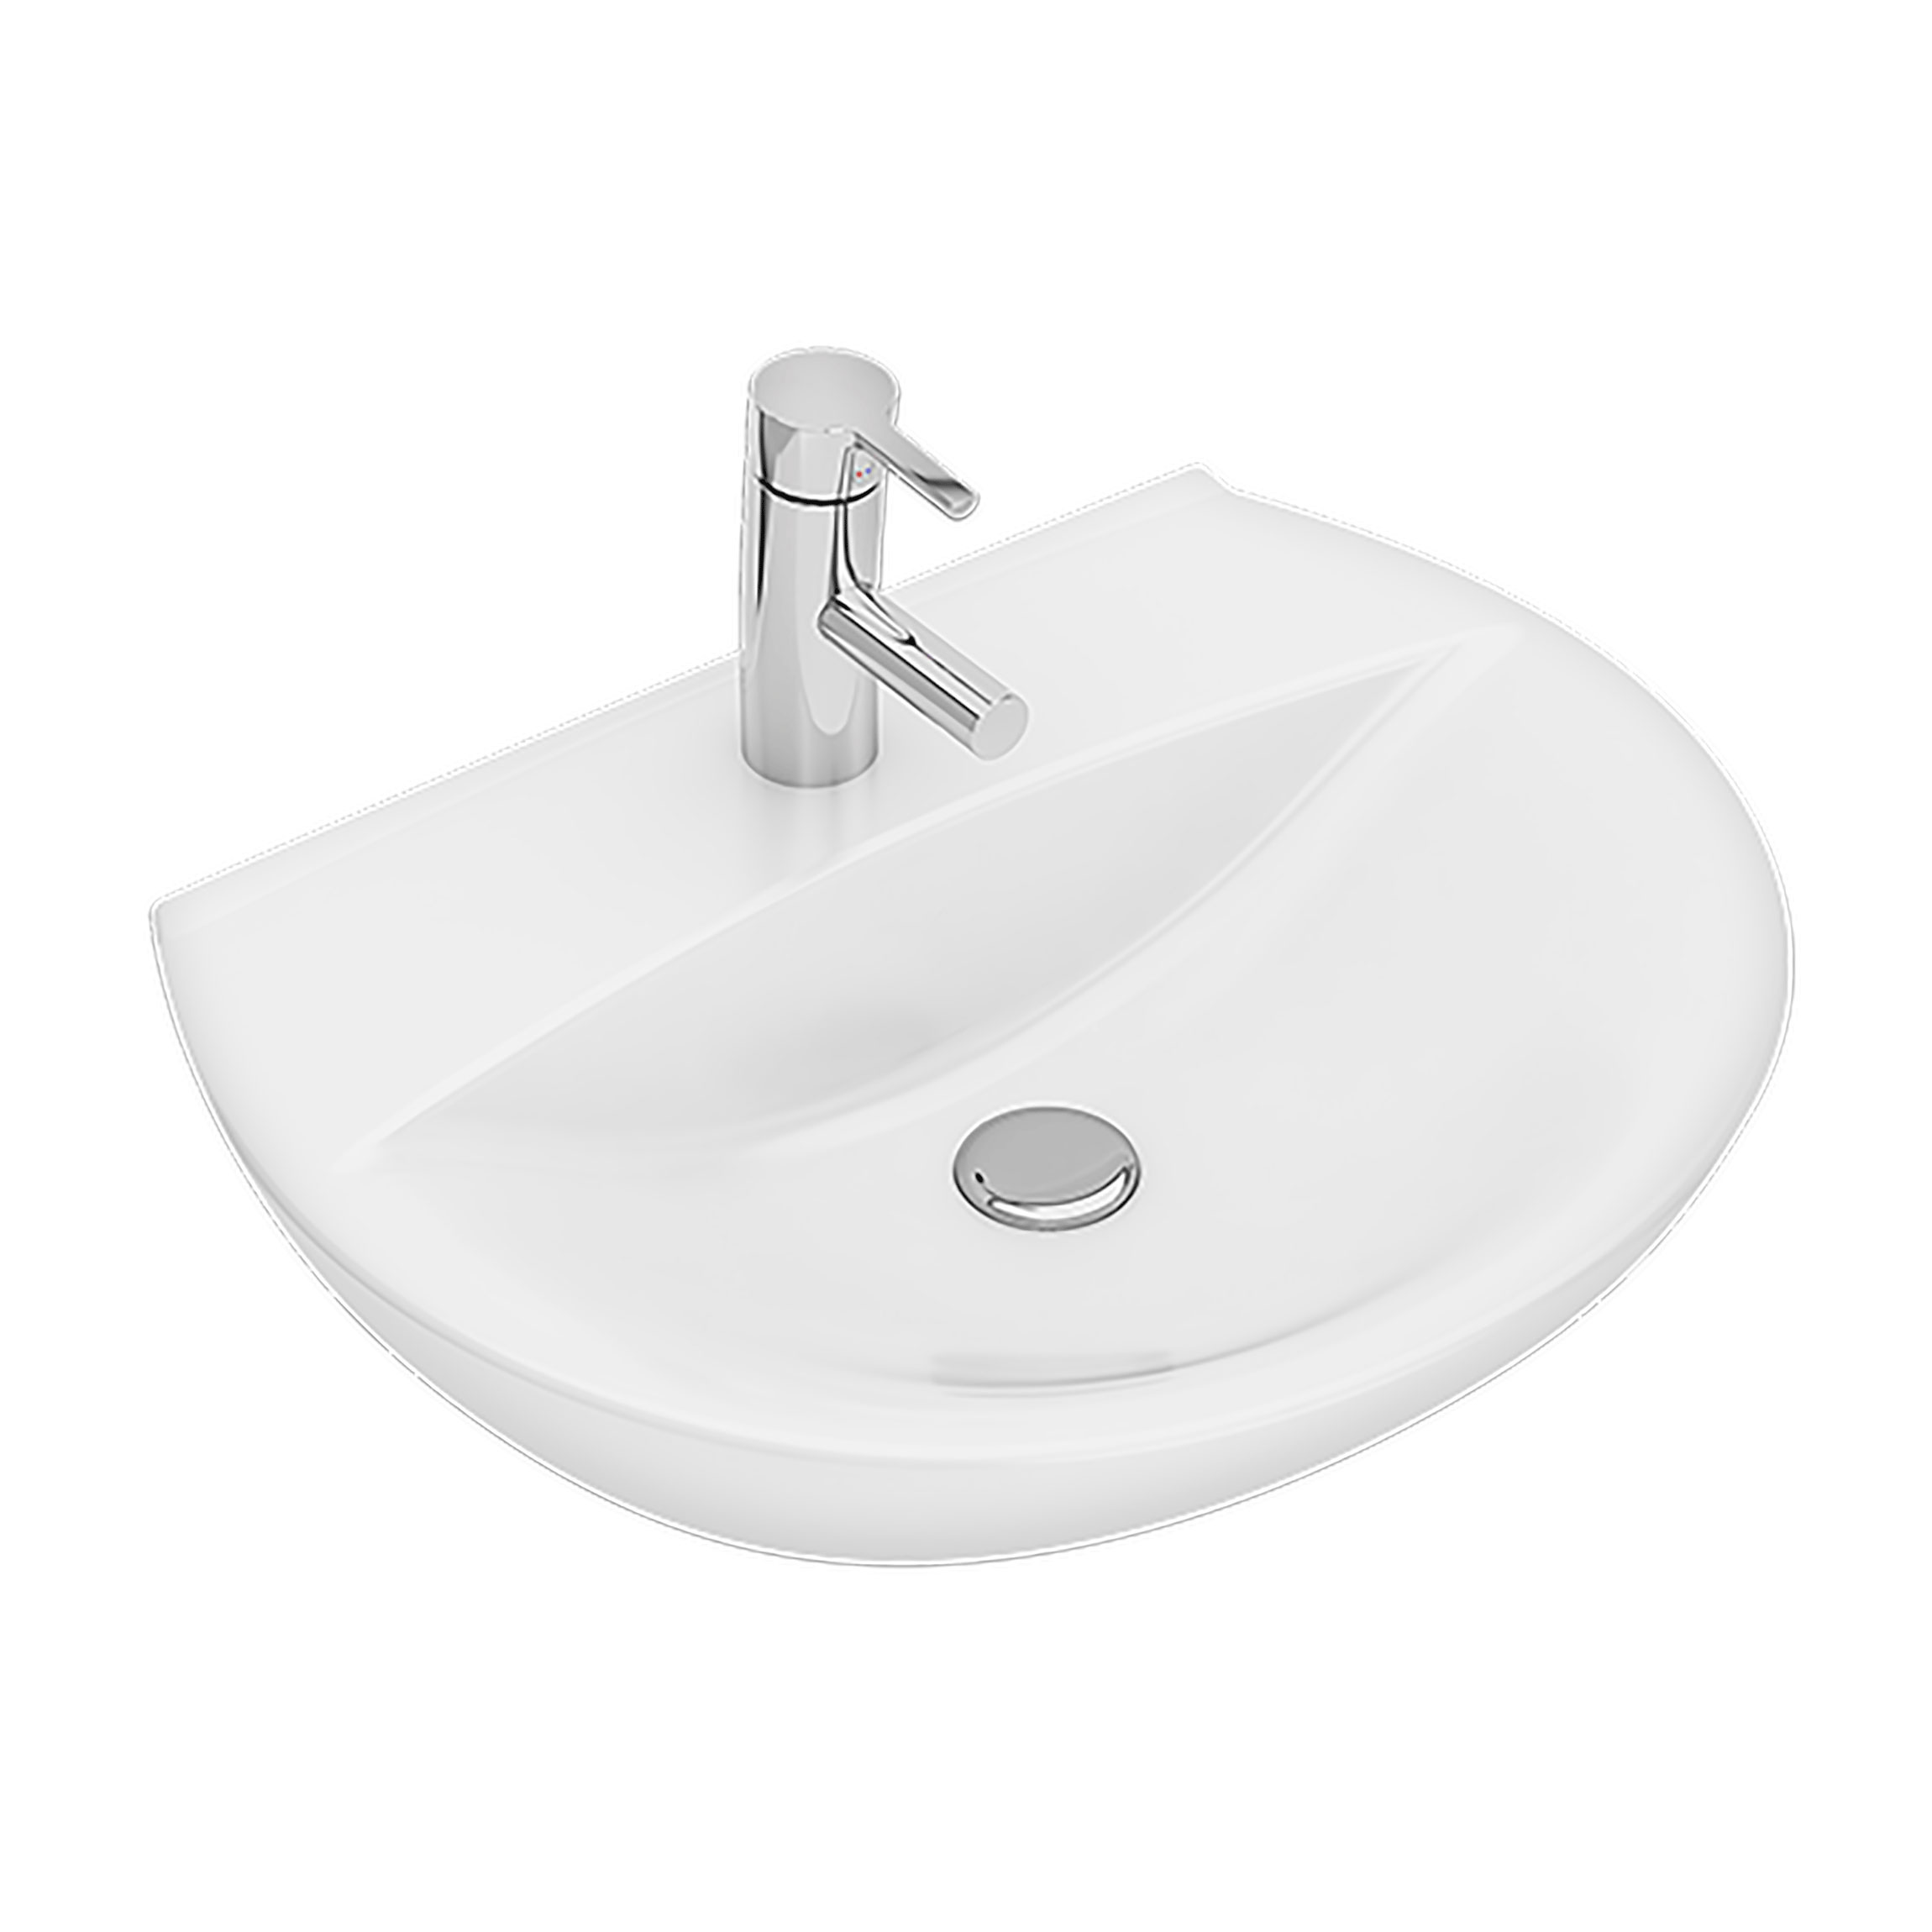 Tvättställ Ifö Spira sjukhustvättställ 60 cm